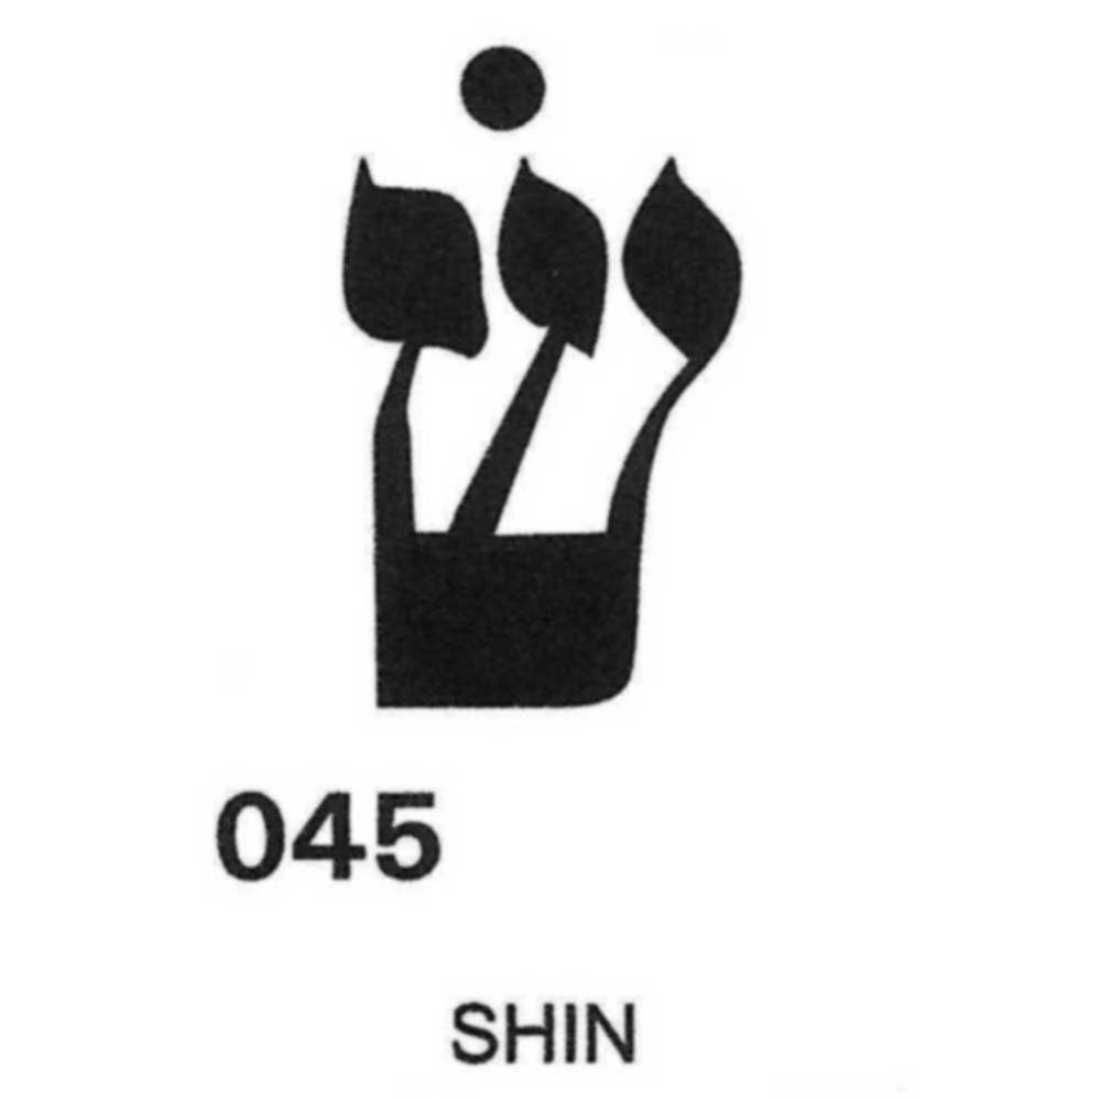 Gráfico Shin PVC 2200